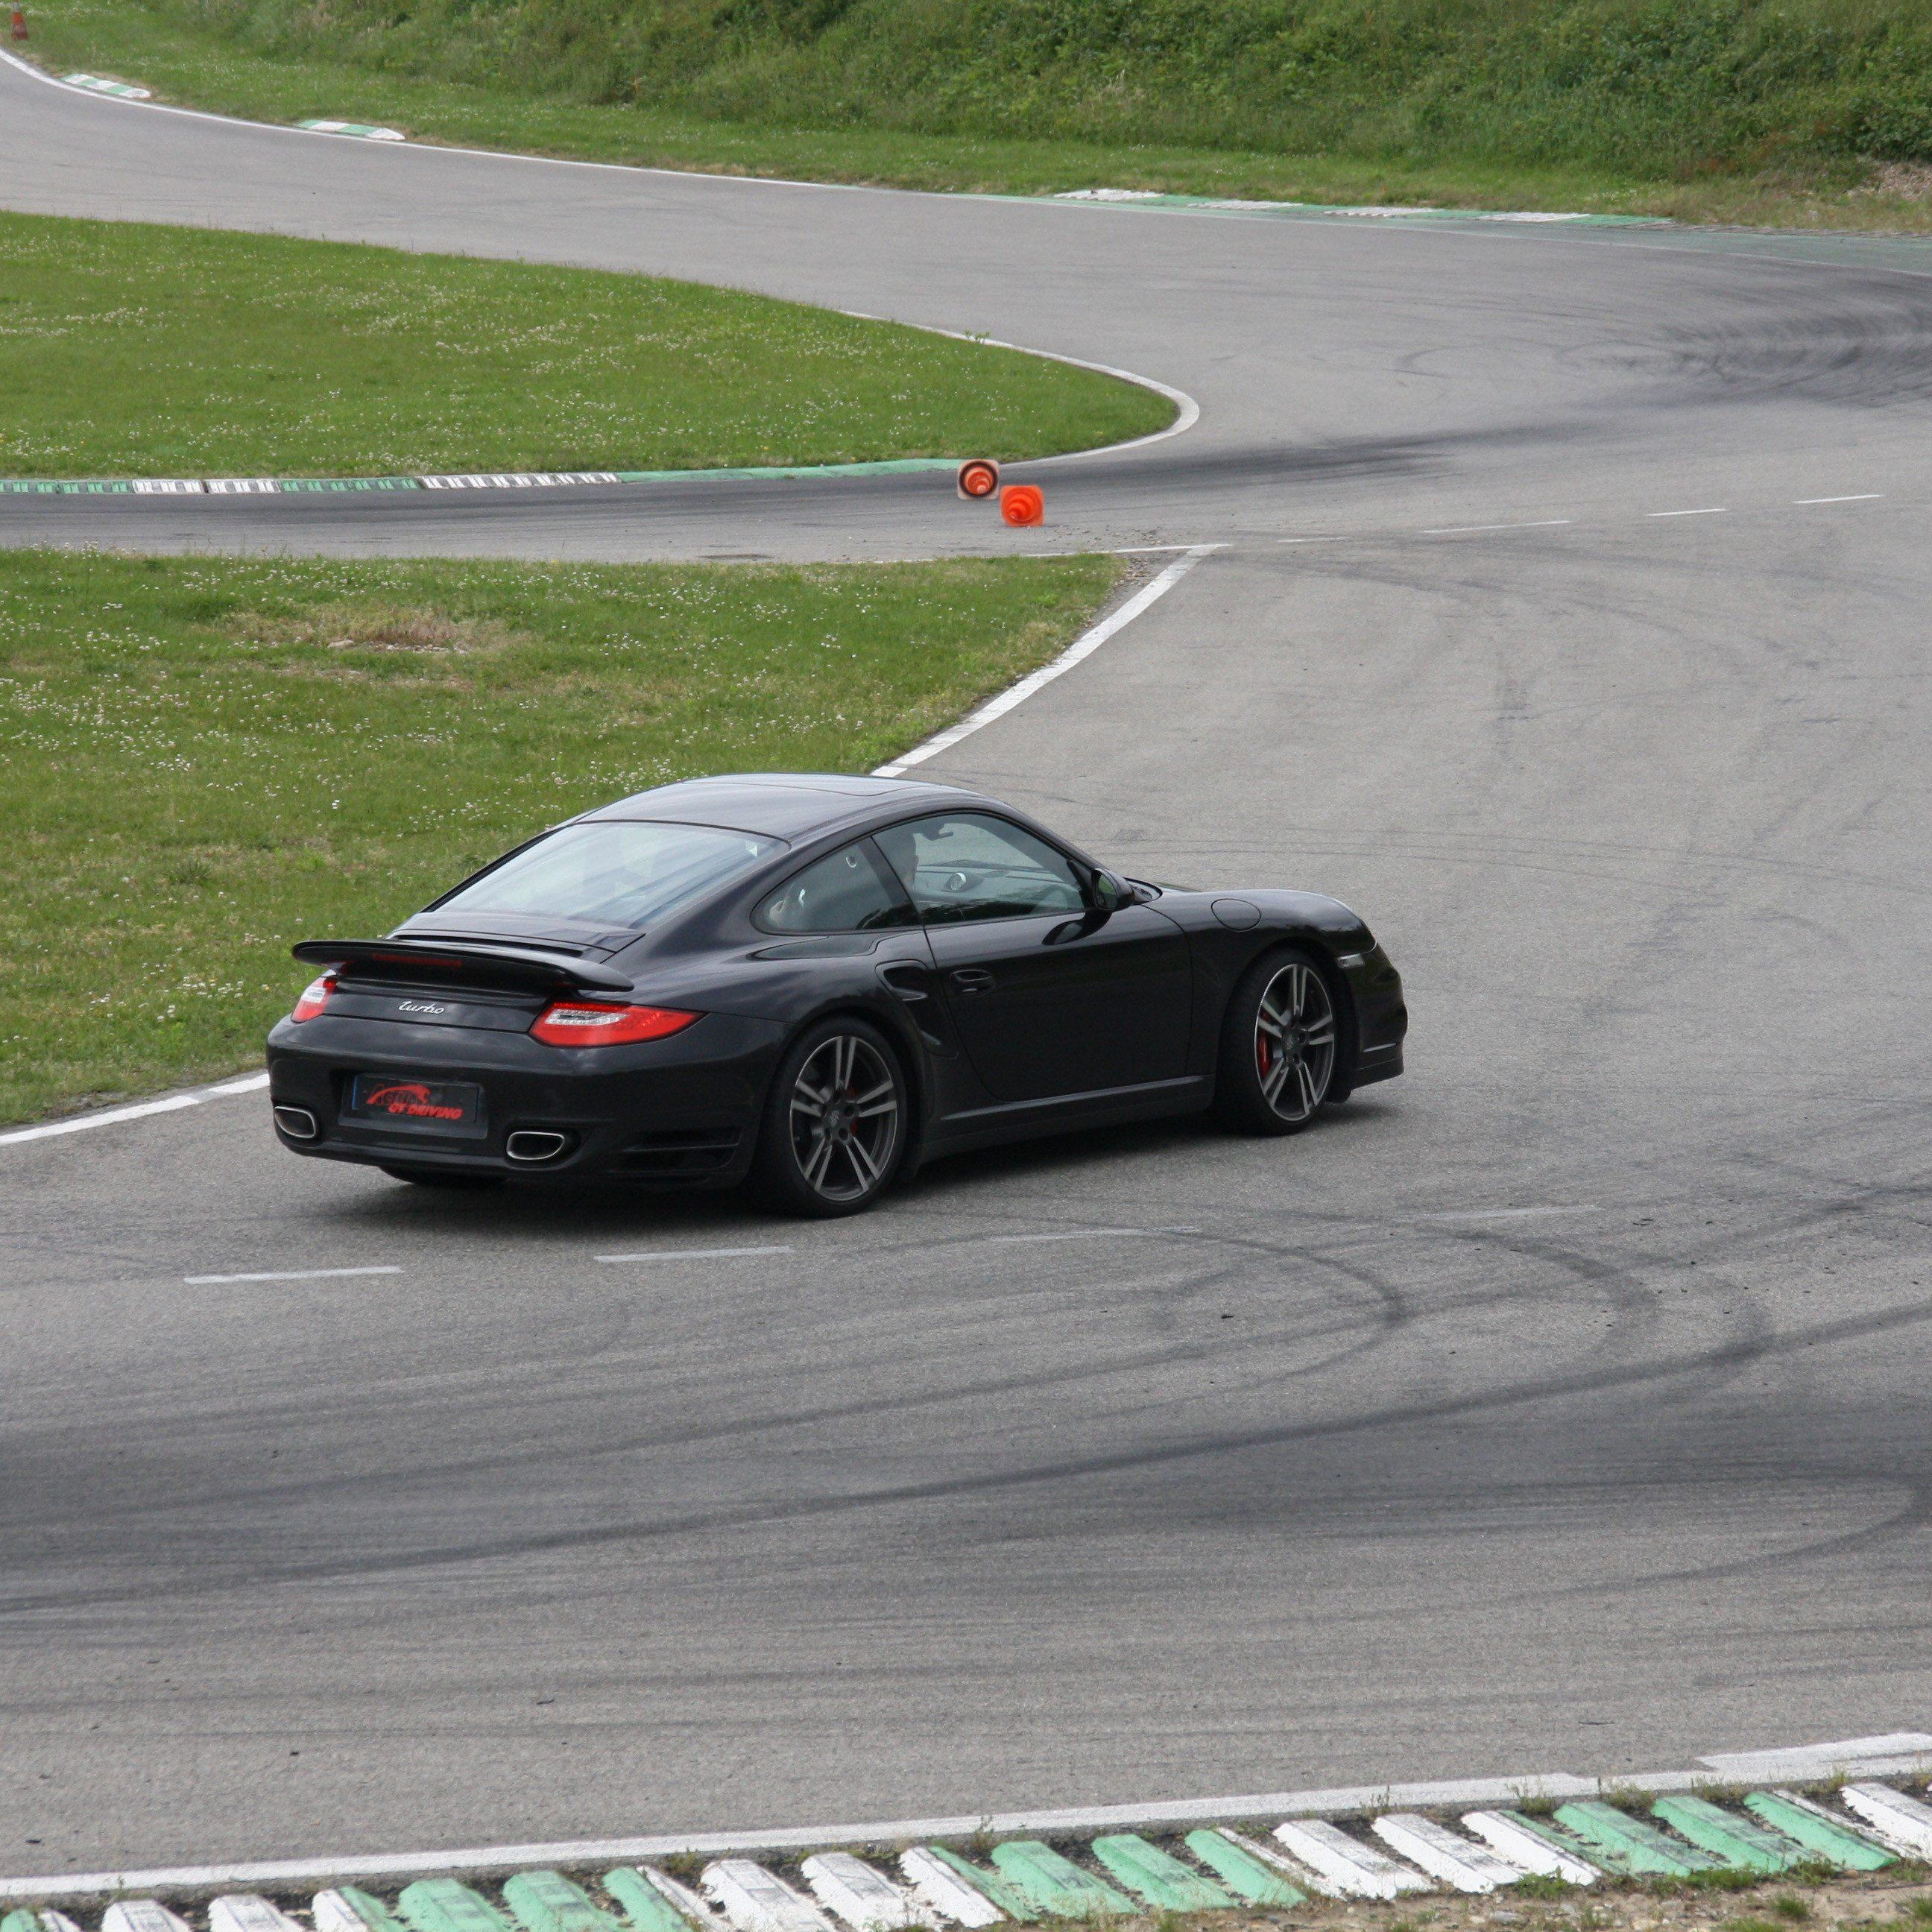 Guida una Porsche 997 BiTurbo da 99 € - Il Sagittario, Latina